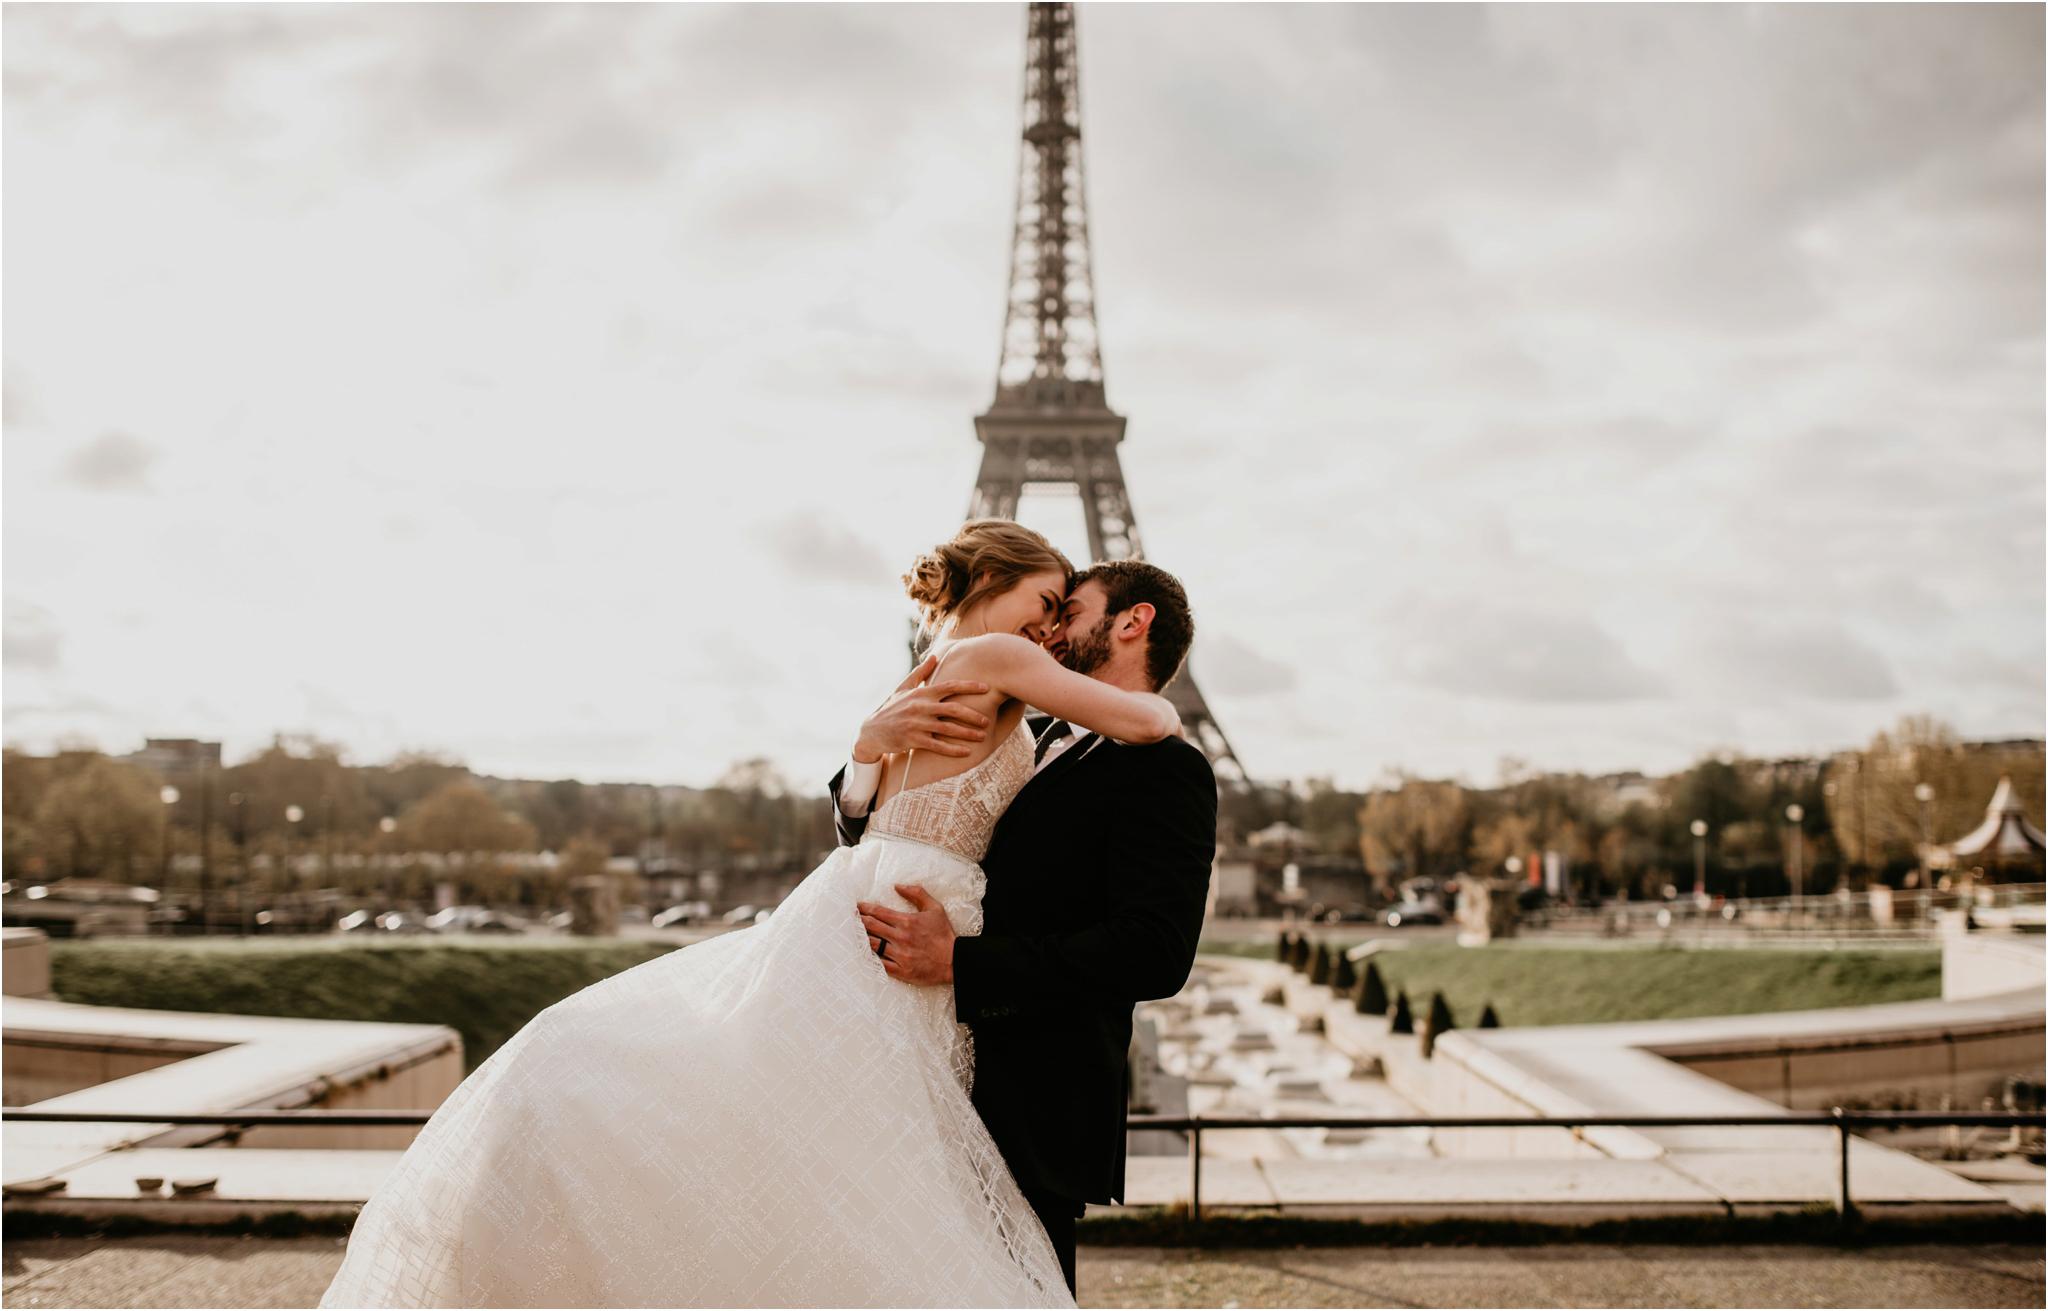 miranda-and-jared-paris-elopement-destination-wedding-photographer-070.jpg